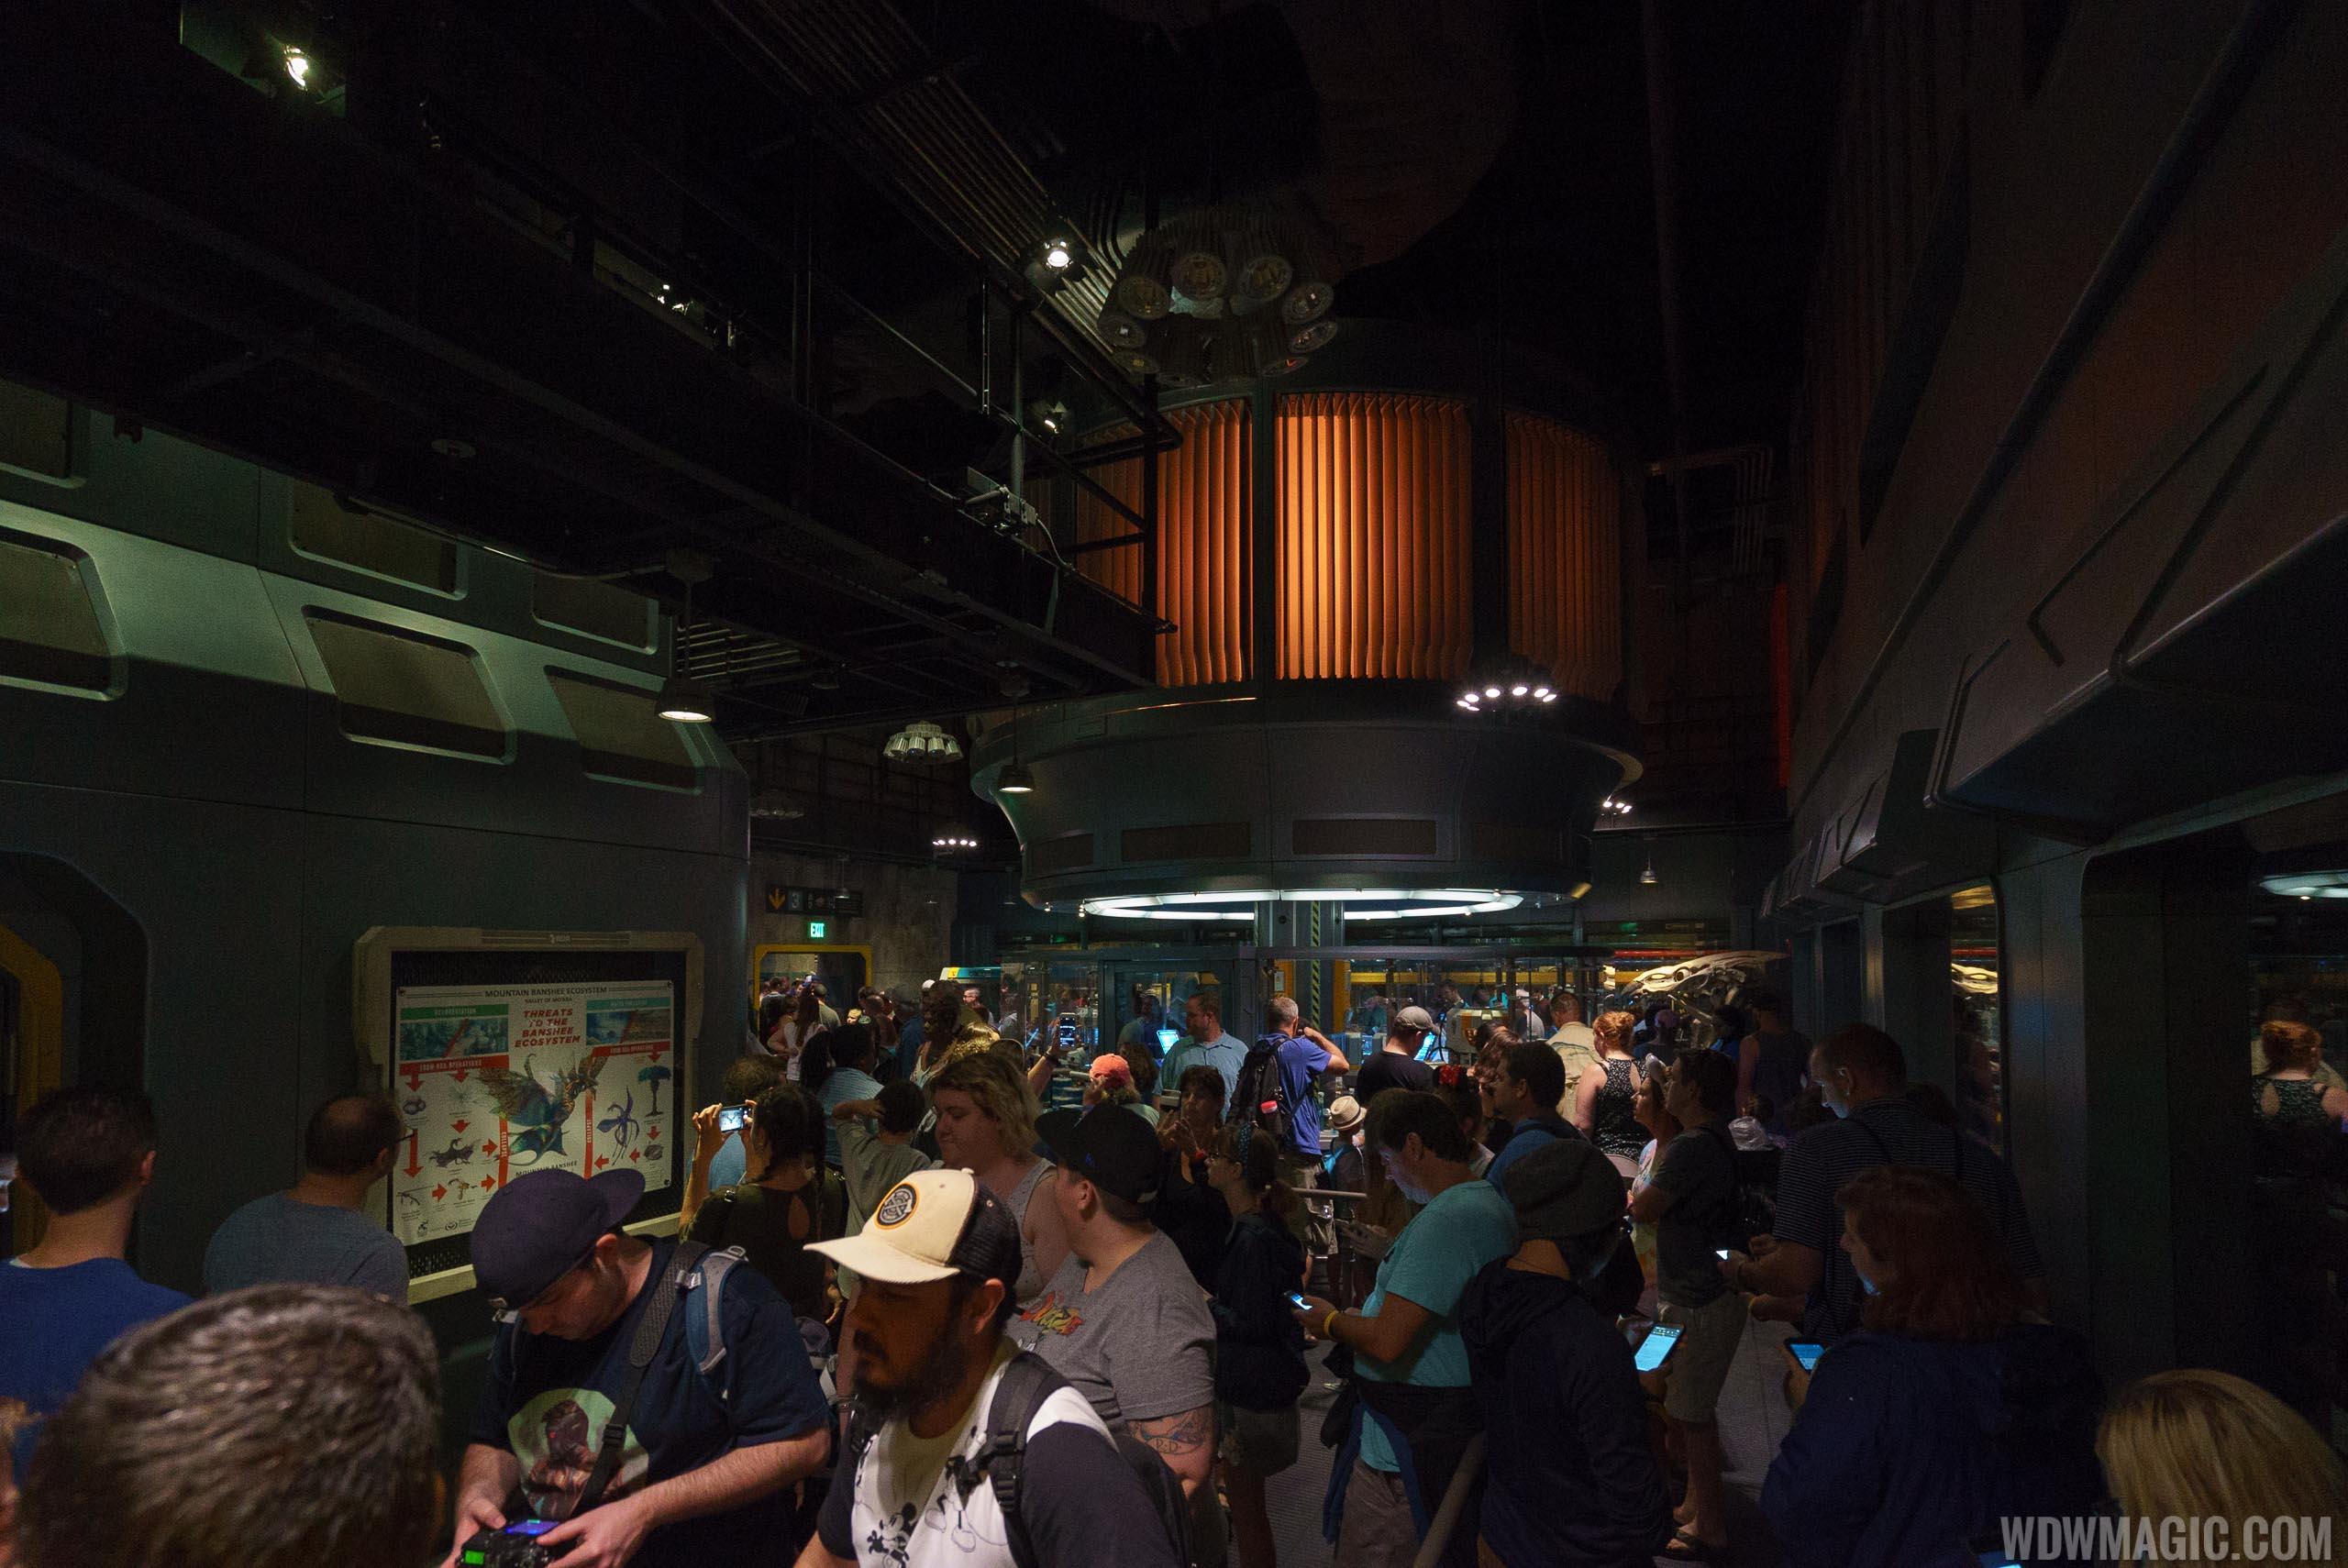 Avatar Flight of Passage queue - The partially restored RDA lab